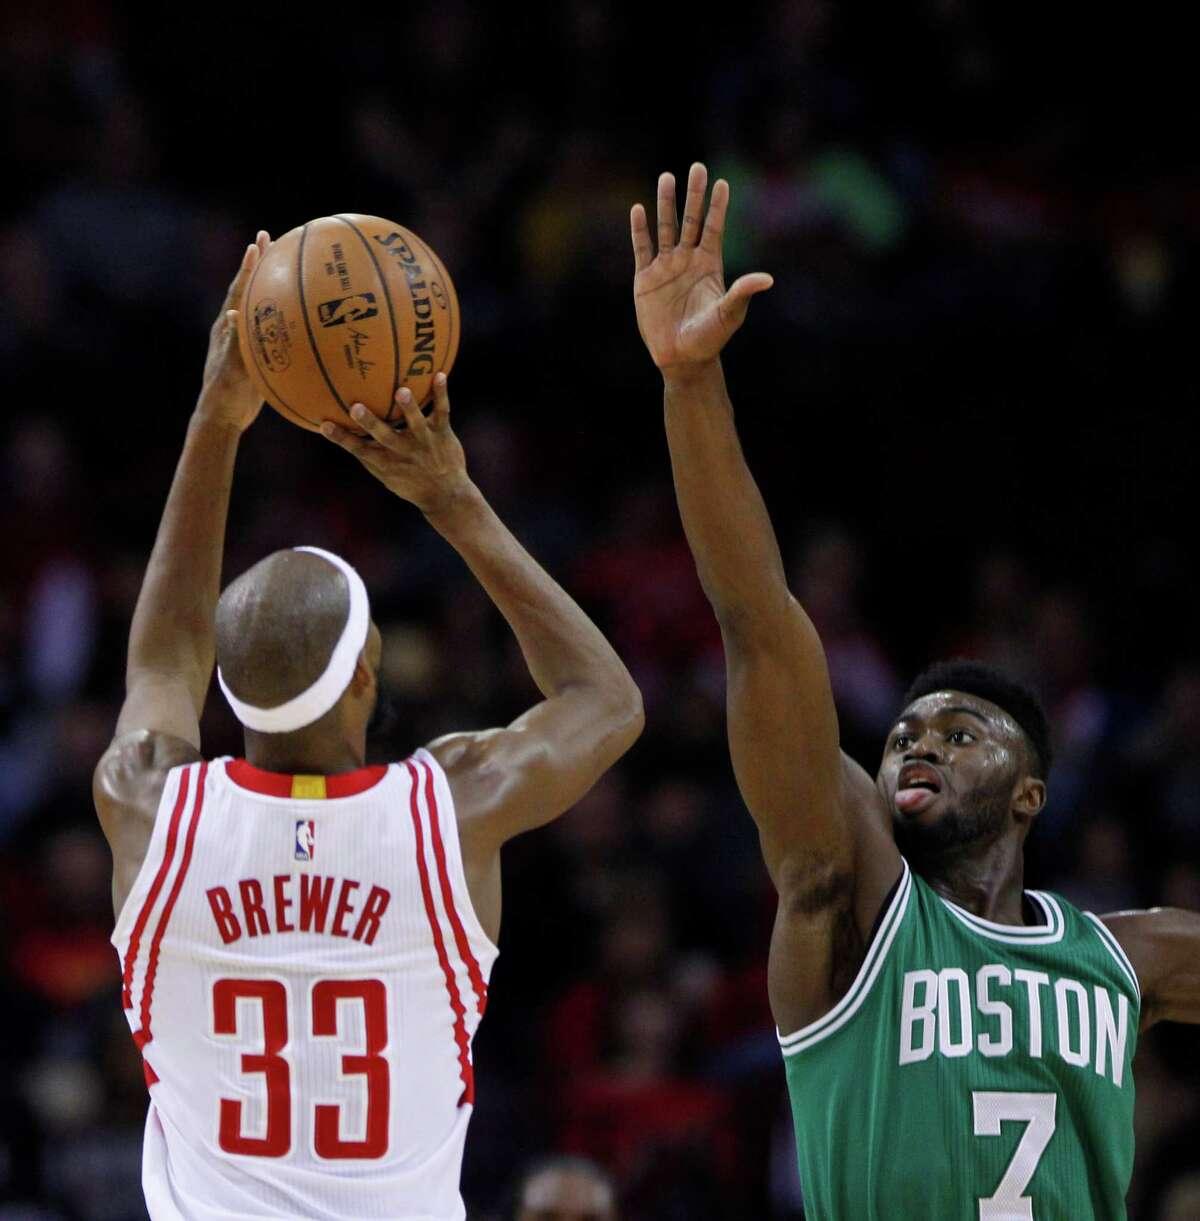 Houston Rockets forward Corey Brewer (33) shoots over Boston Celtics forward Jaylen Brown (7) during the Rockets game against the Boston Celtics at Toyota Center, Monday, Dec. 5, 2016, in Houston.